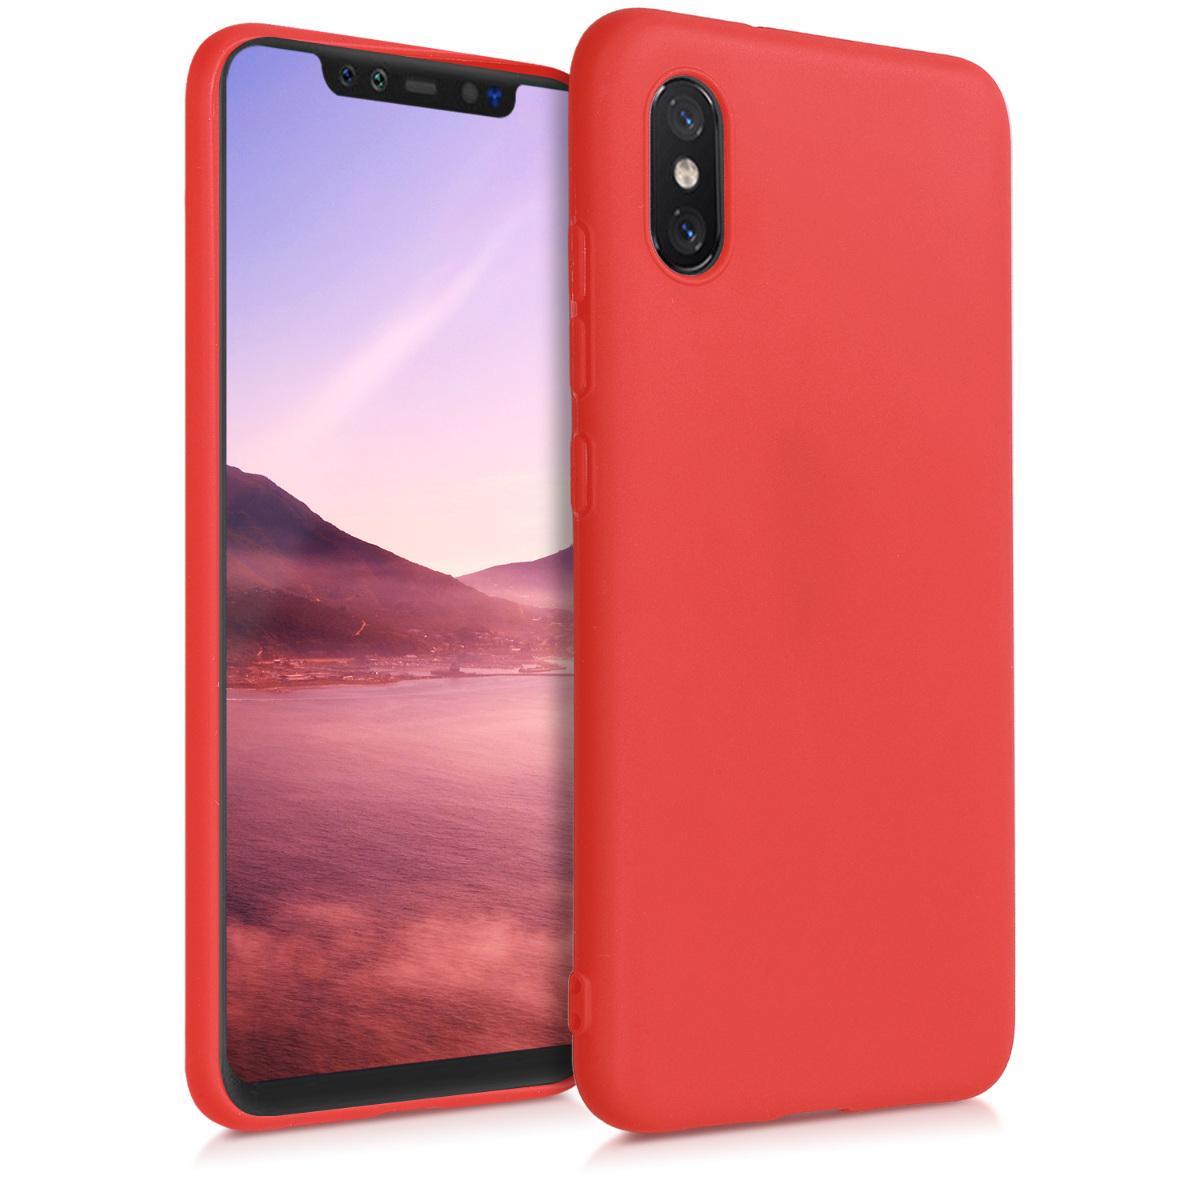 KW Θήκη Σιλικόνης Xiaomi Mi 8 Pro - Red Matte (46454.51)